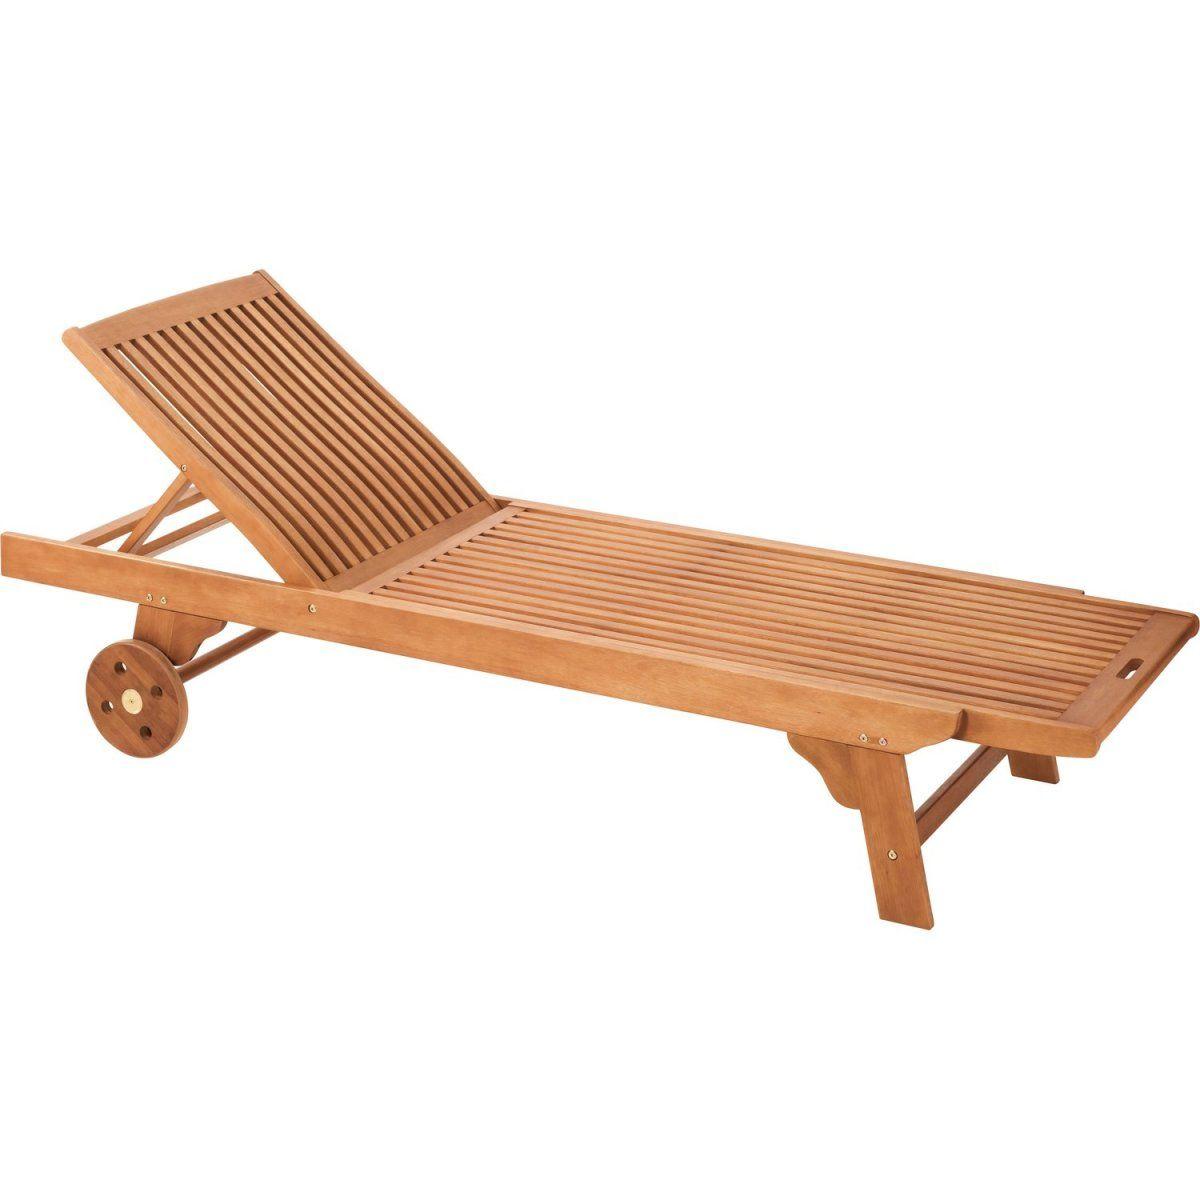 Obi Sonnenliege Greenville Jetzt Bestellen Unter Https Moebel Ladendirekt De Garten Gartenmoebel Garte Gartenliege Aus Paletten Gartenliege Gartenliege Holz